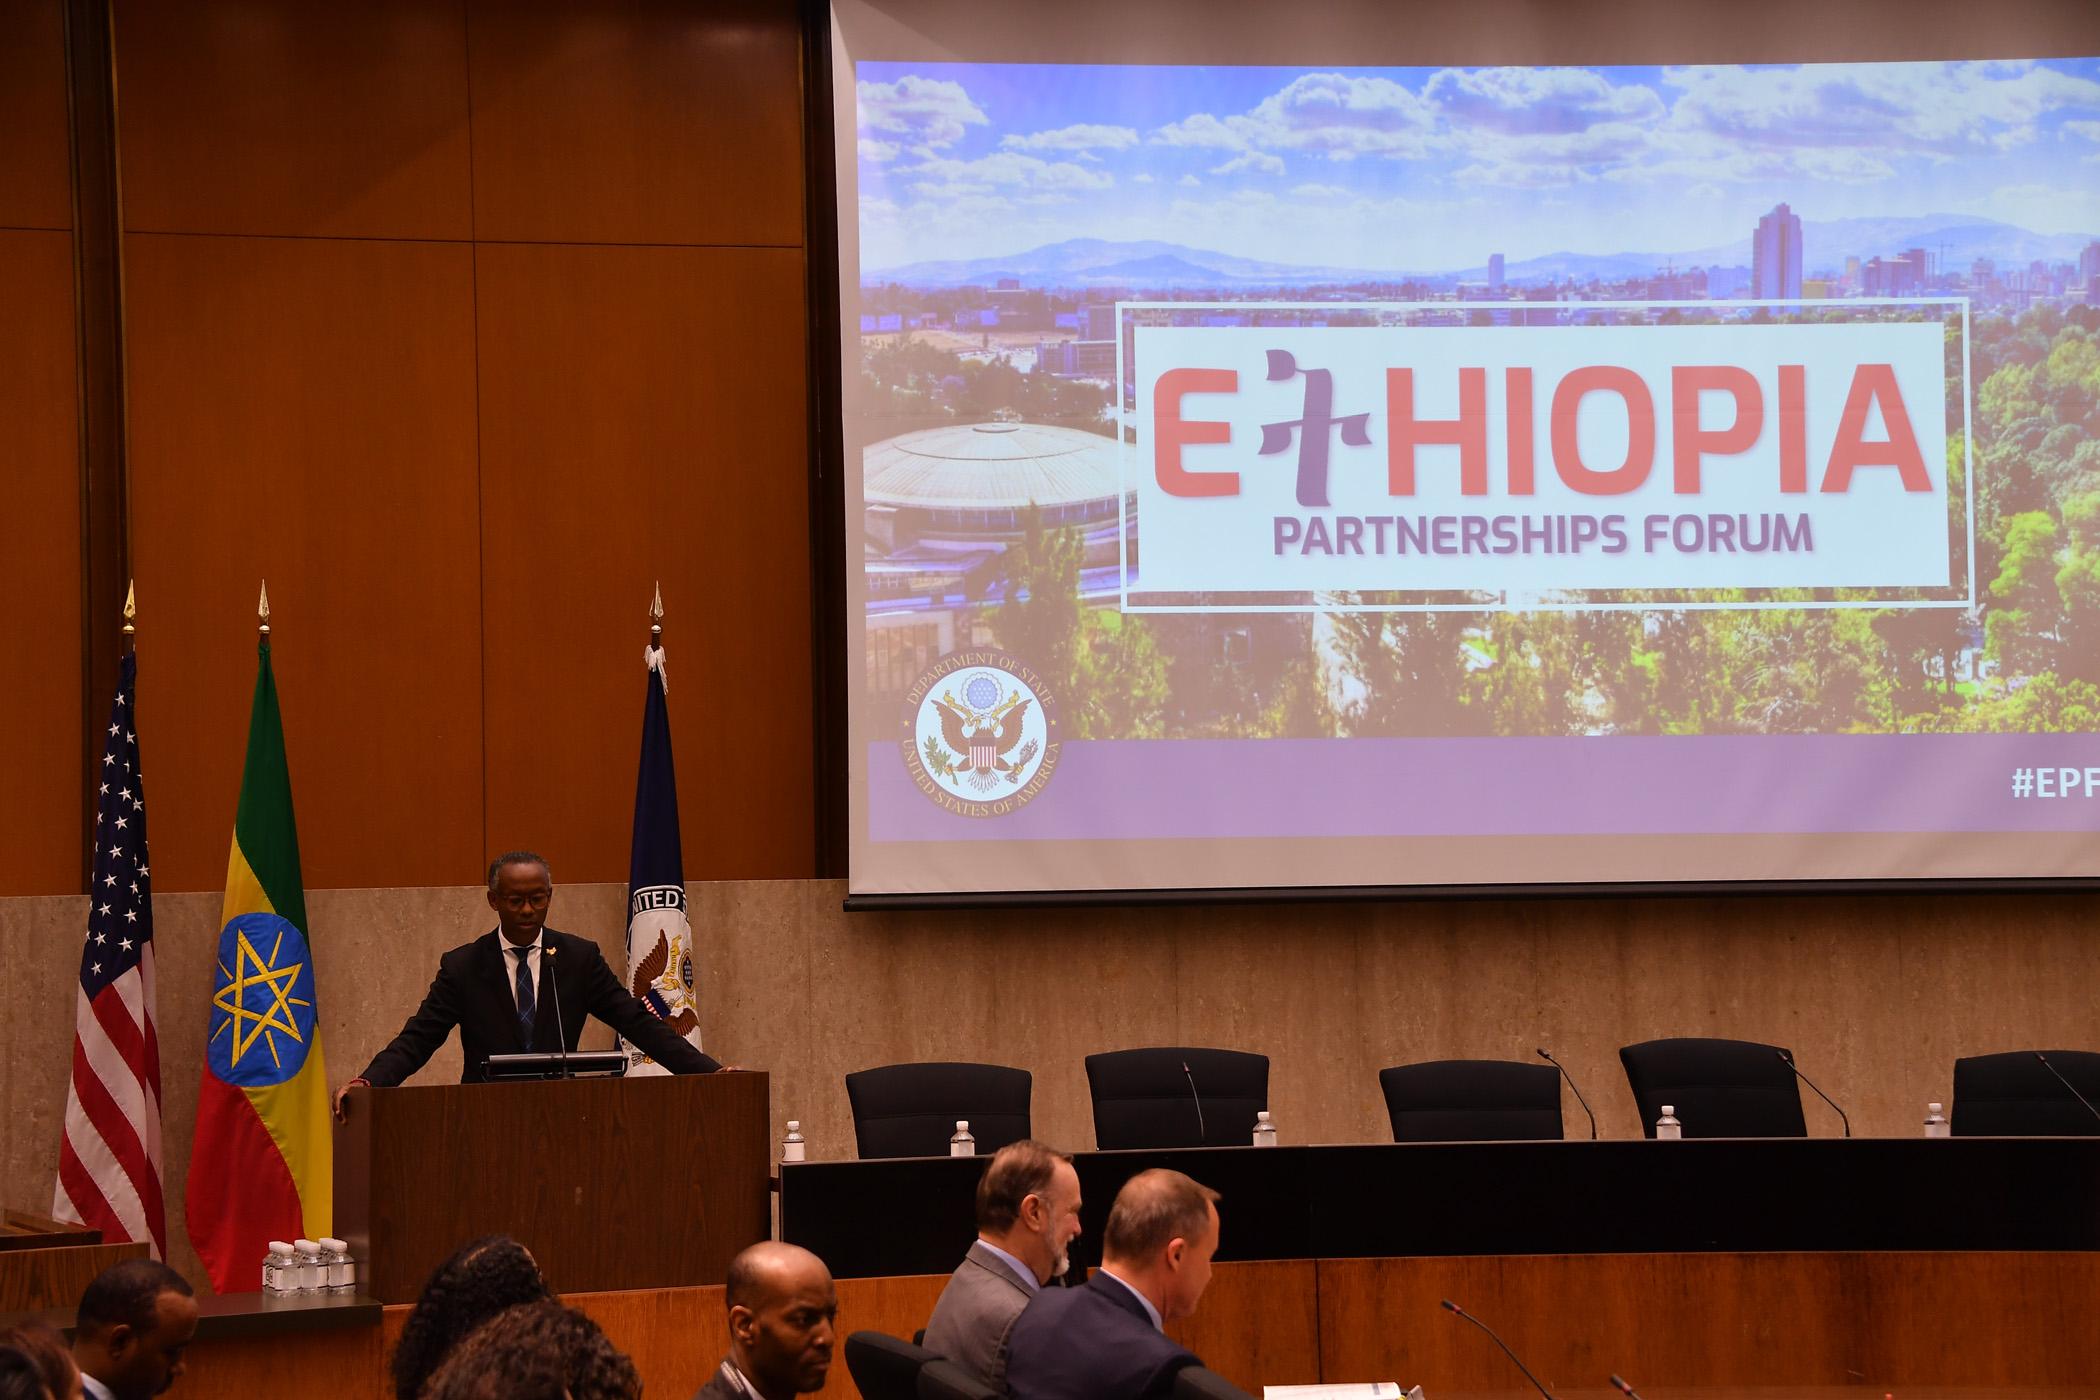 Ethiopia Partnerships Forum